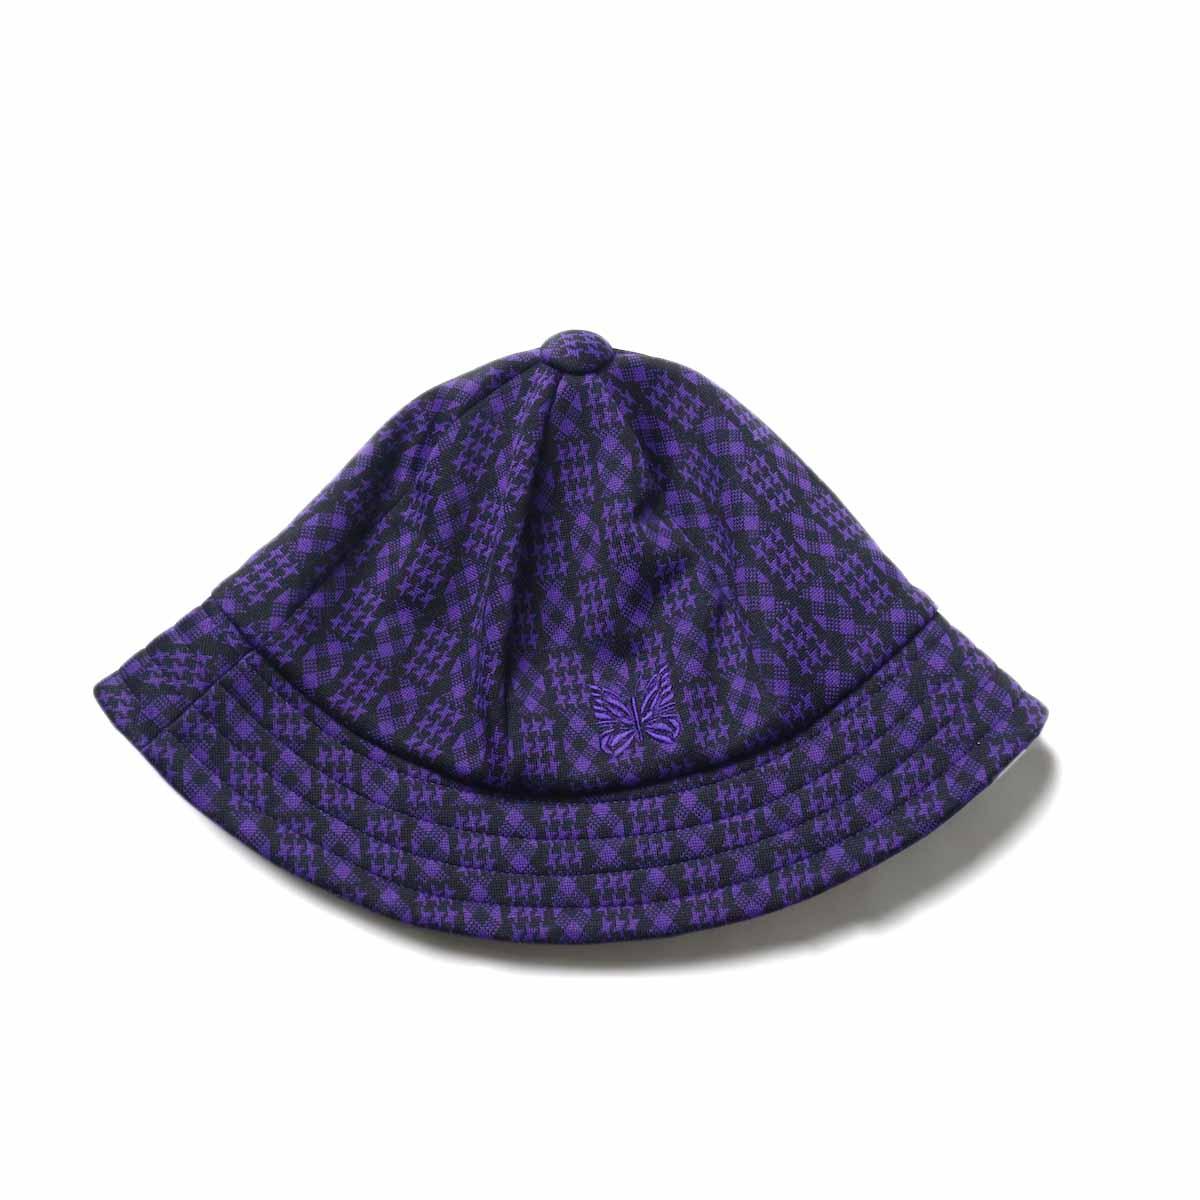 Needles / Bermuda Hat -Poly Jq. (Houndstooth)